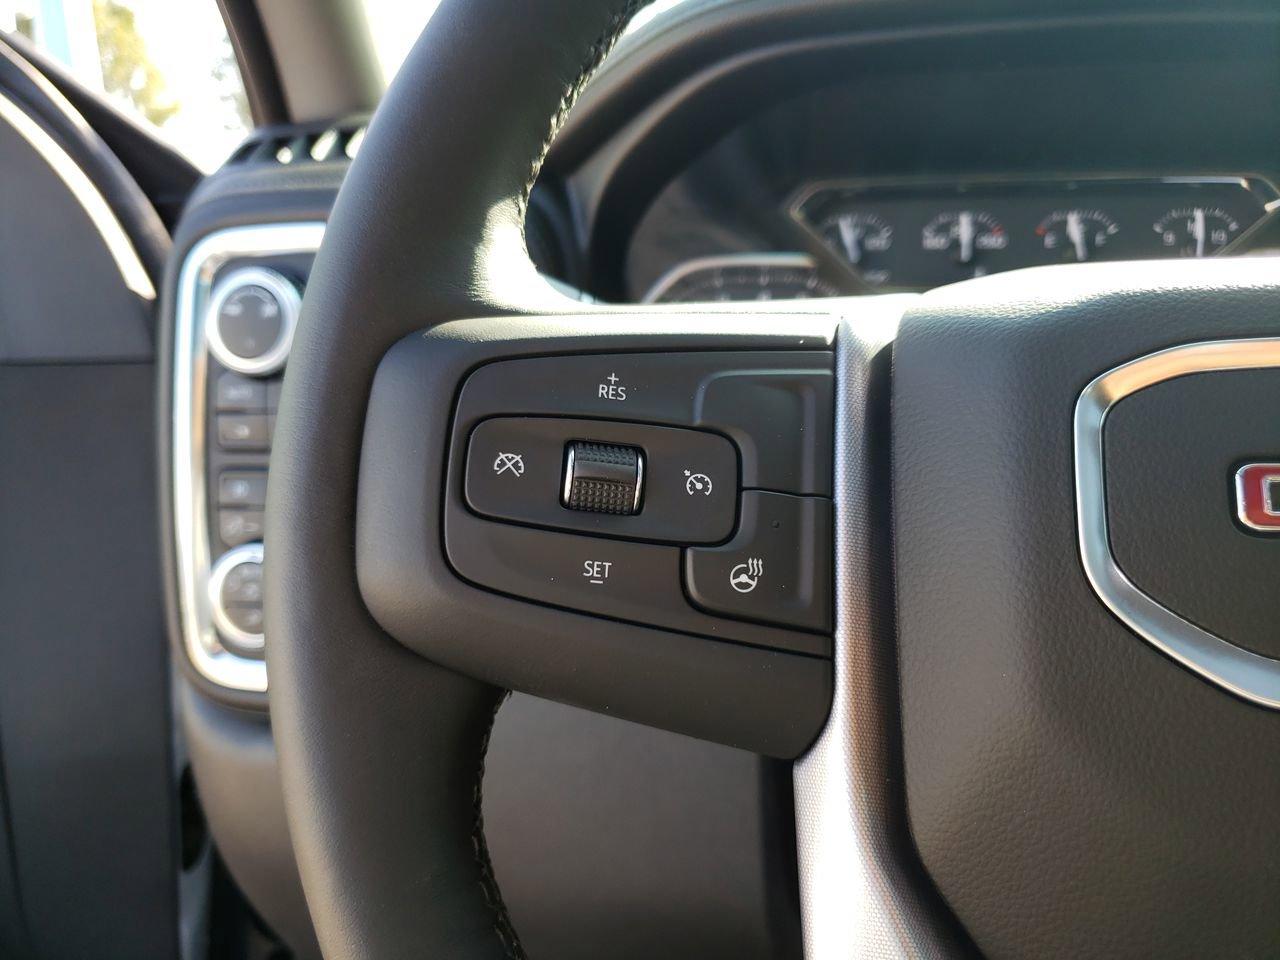 New 2019 GMC Sierra 1500 SLT